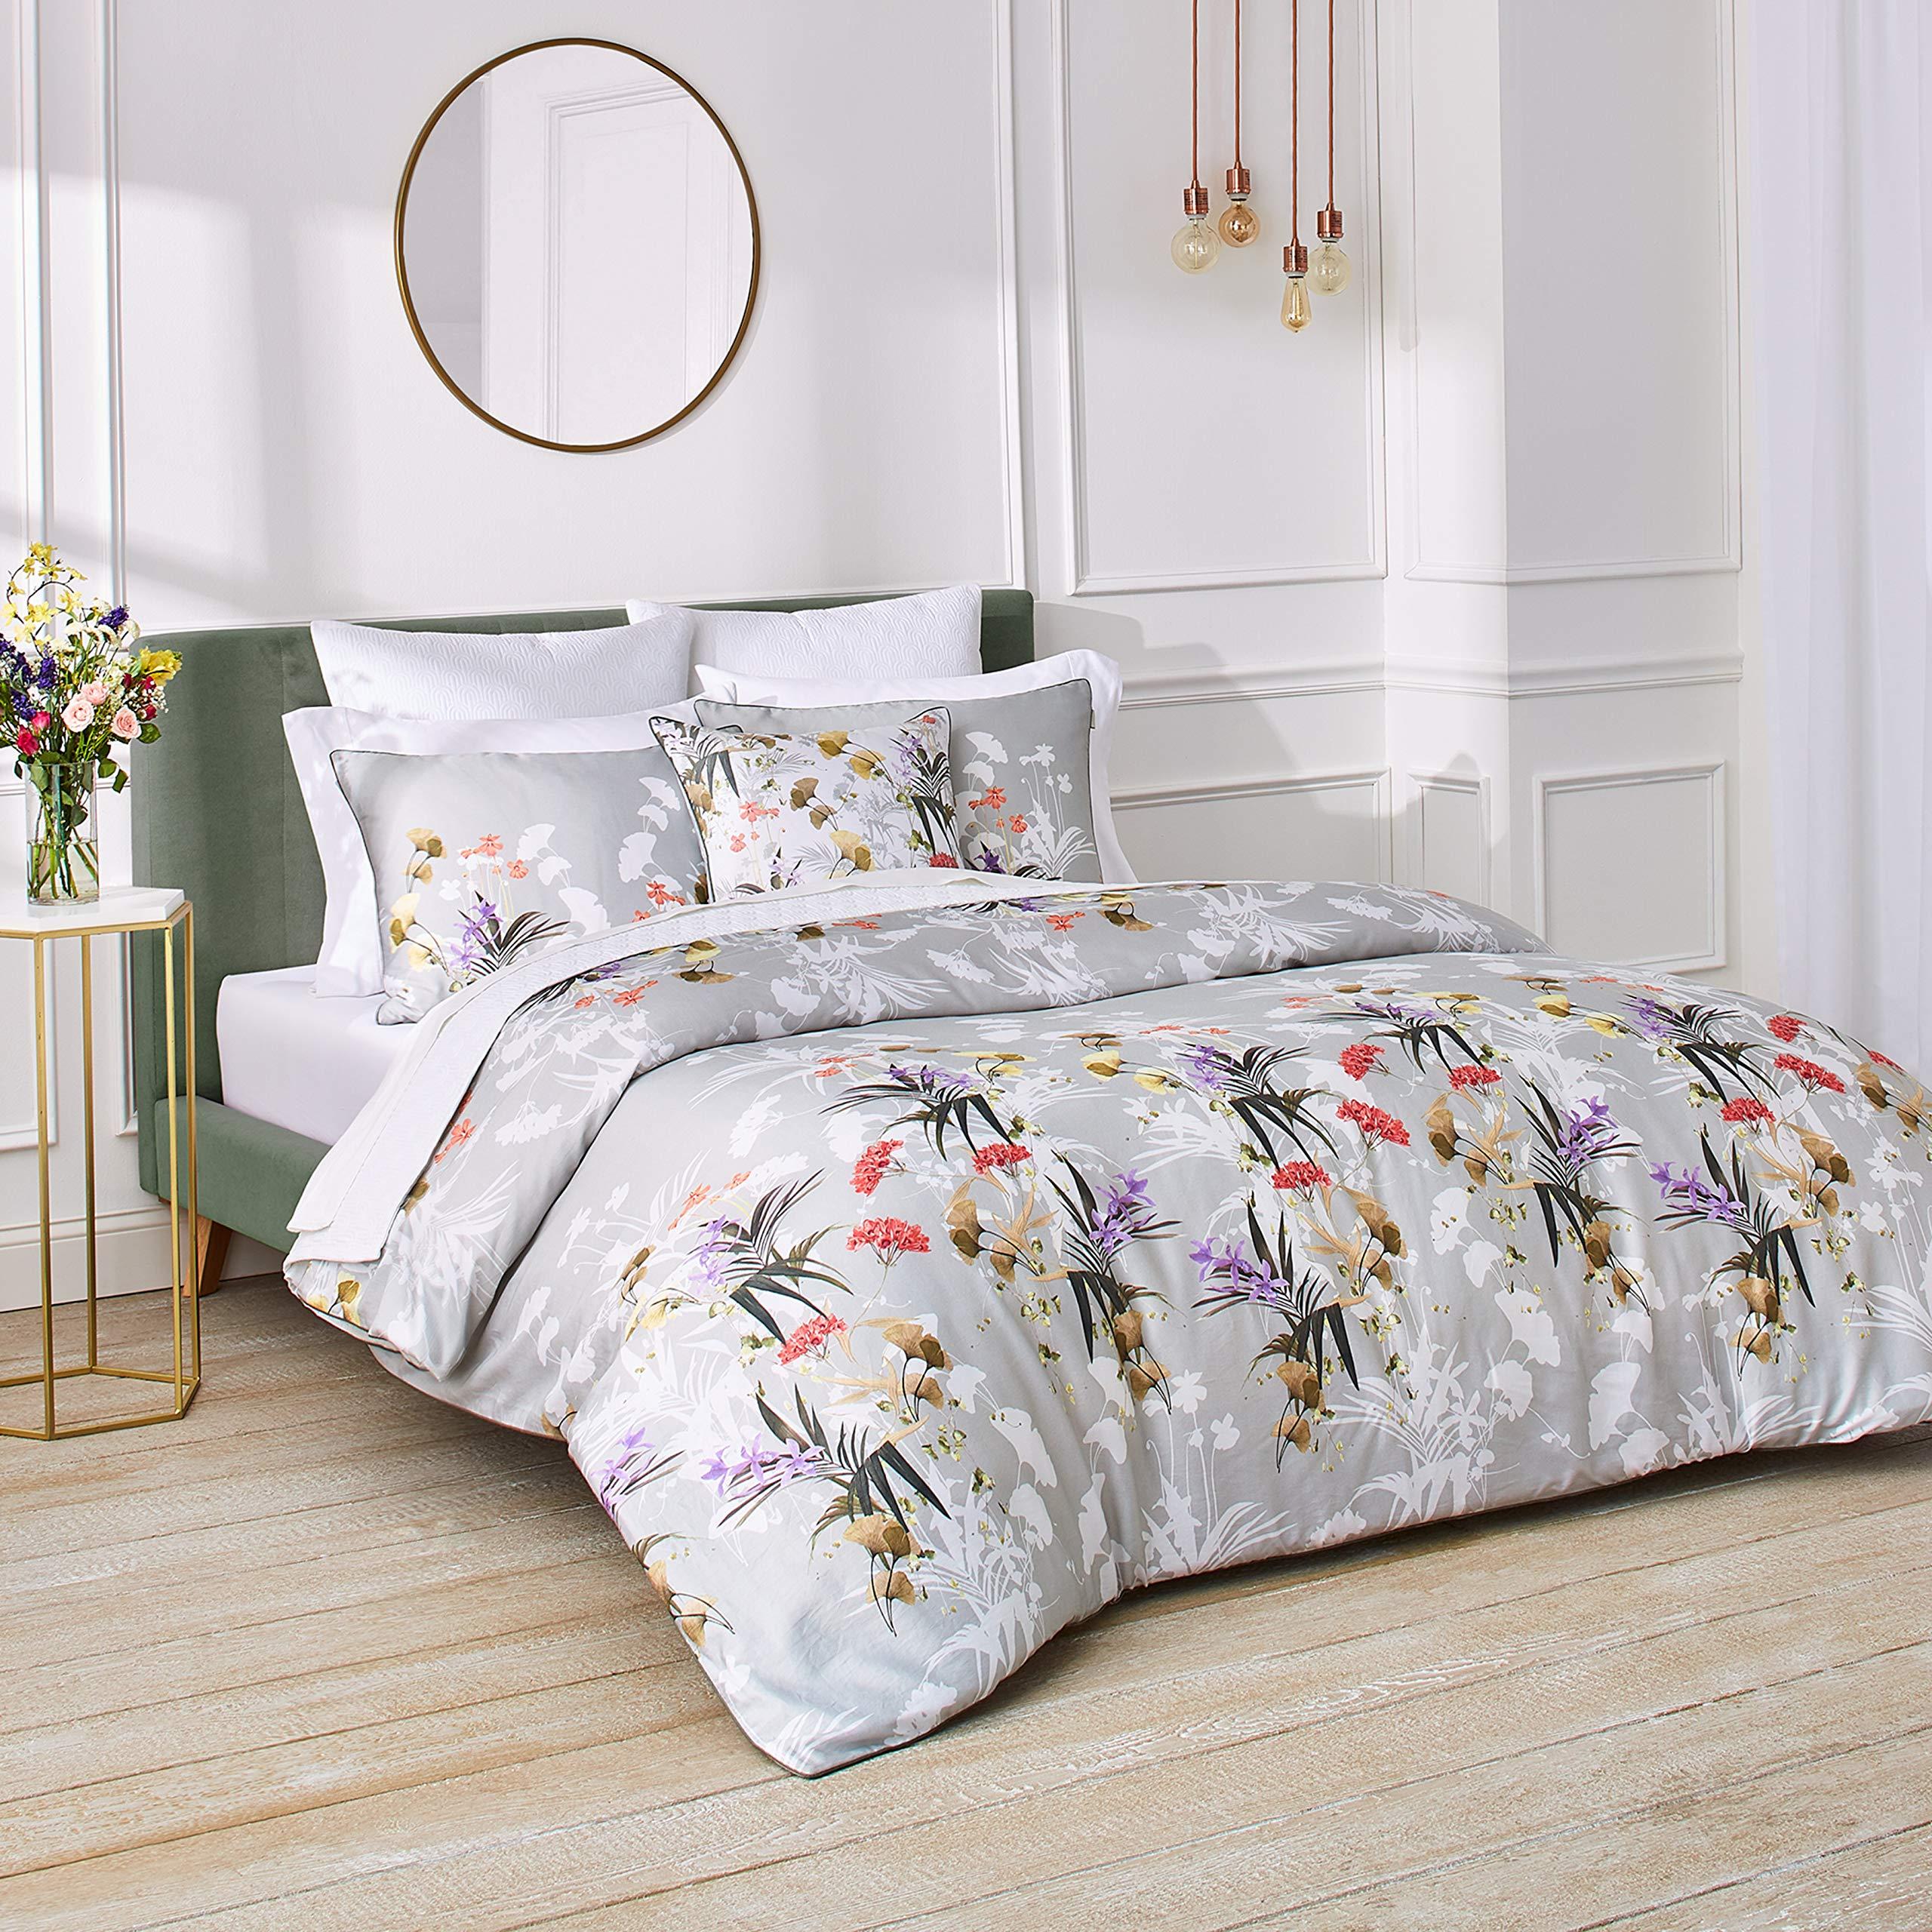 Ted Baker Highland 3 Piece Cotton Sateen Comforter Set W Shams Flower Design 92ʺw X 96ʺl Full Queen Green Home Kitchen